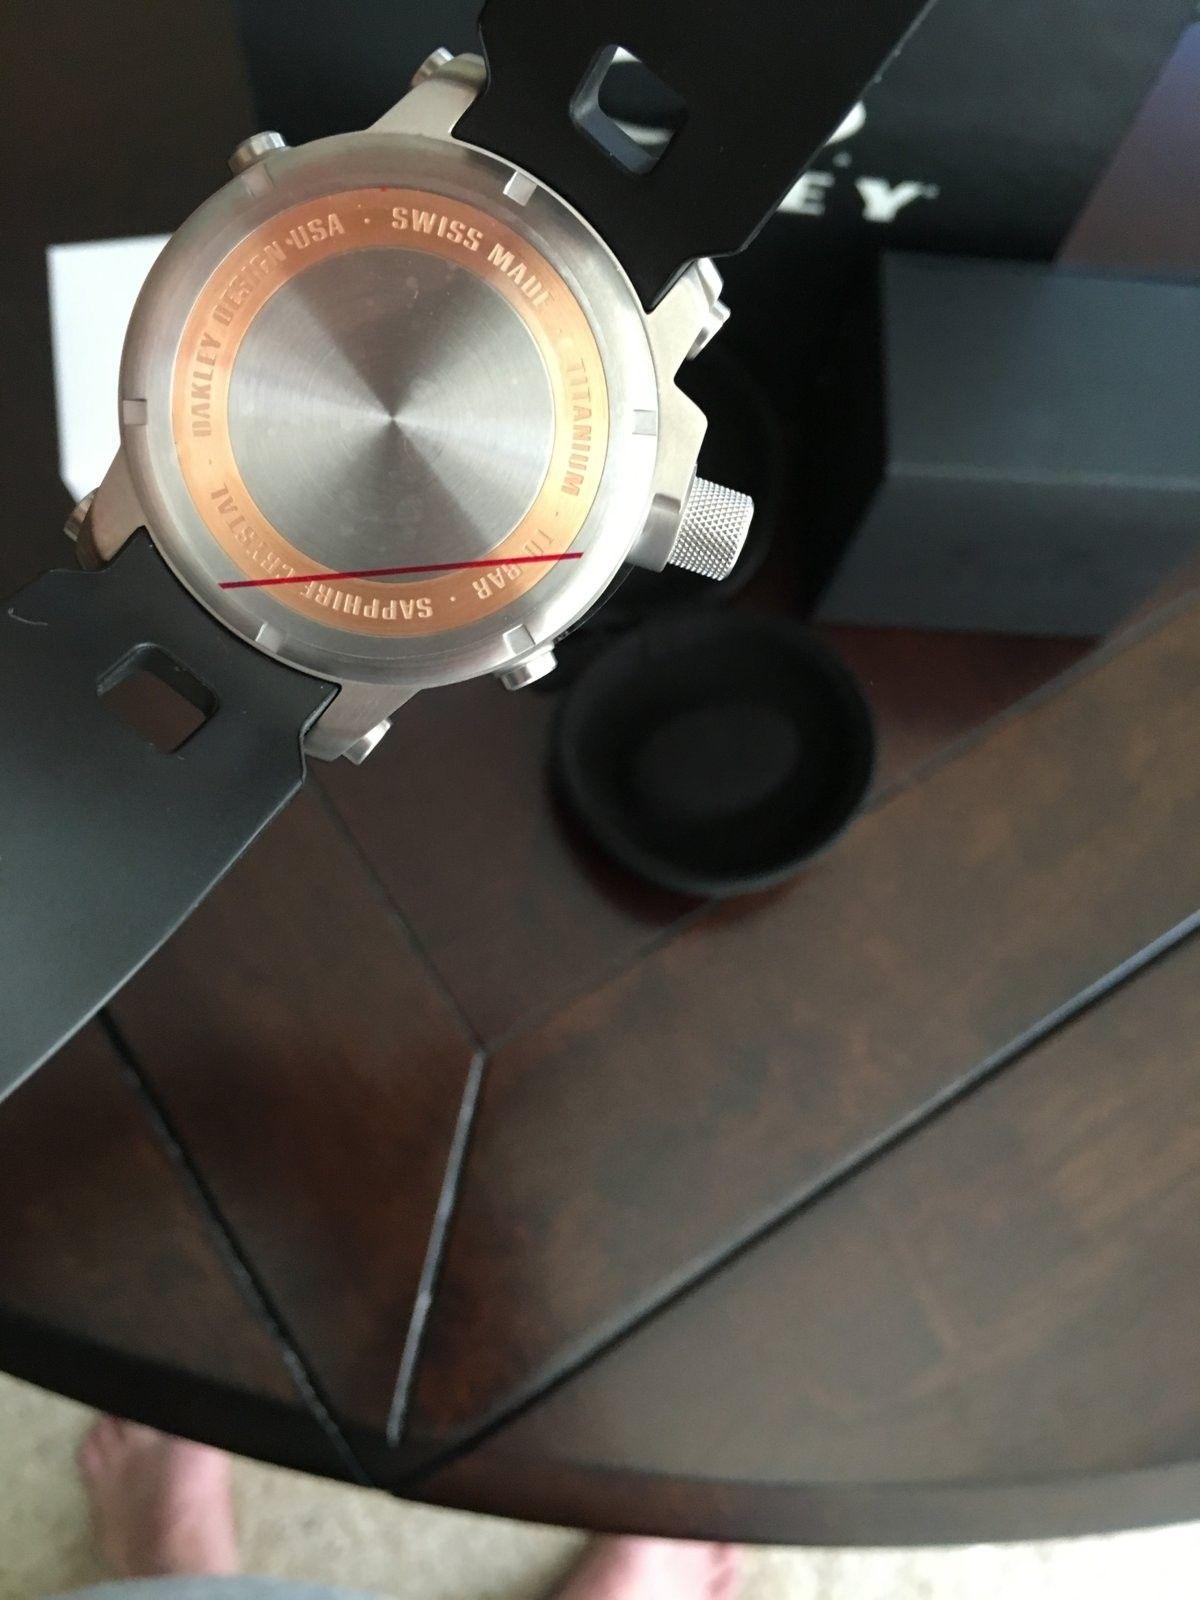 BNIB Holiday Titanium Killswitch Watch - IMG_1088.JPG